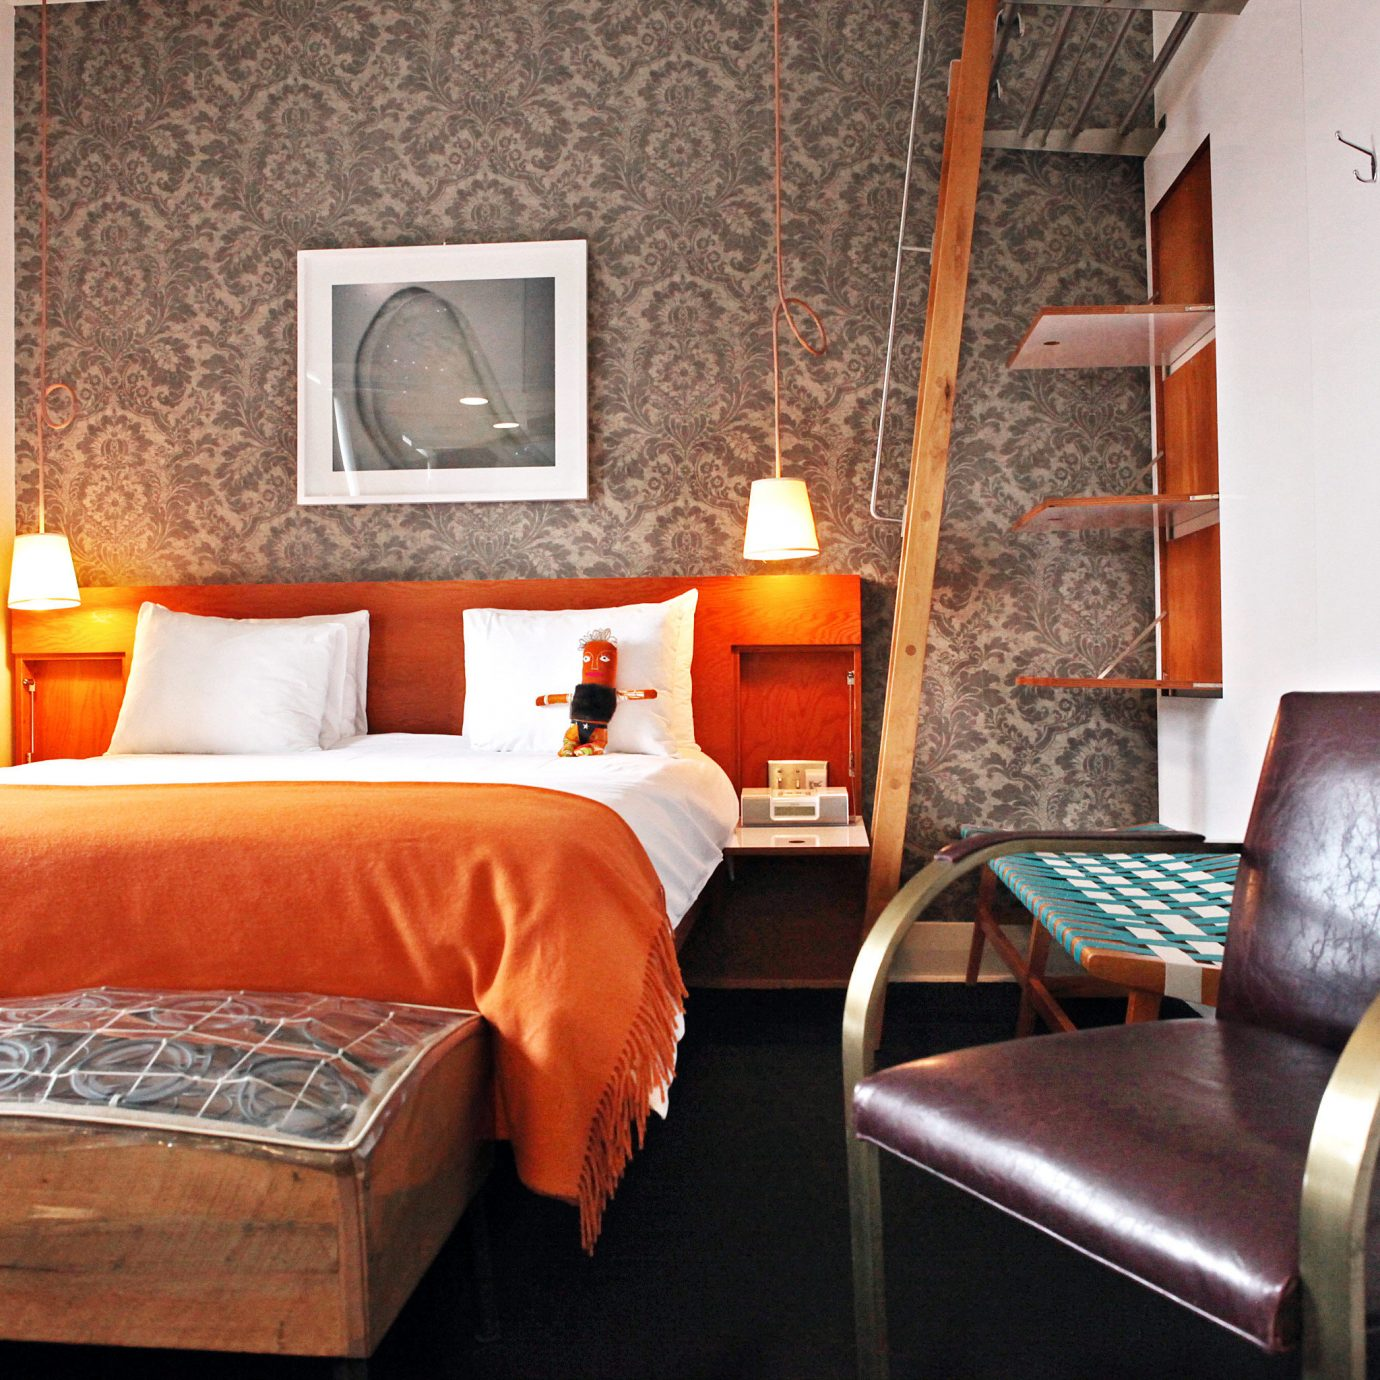 Bedroom Boutique City Girls Getaways Hip Modern Trip Ideas Weekend Getaways chair property Suite cottage home living room